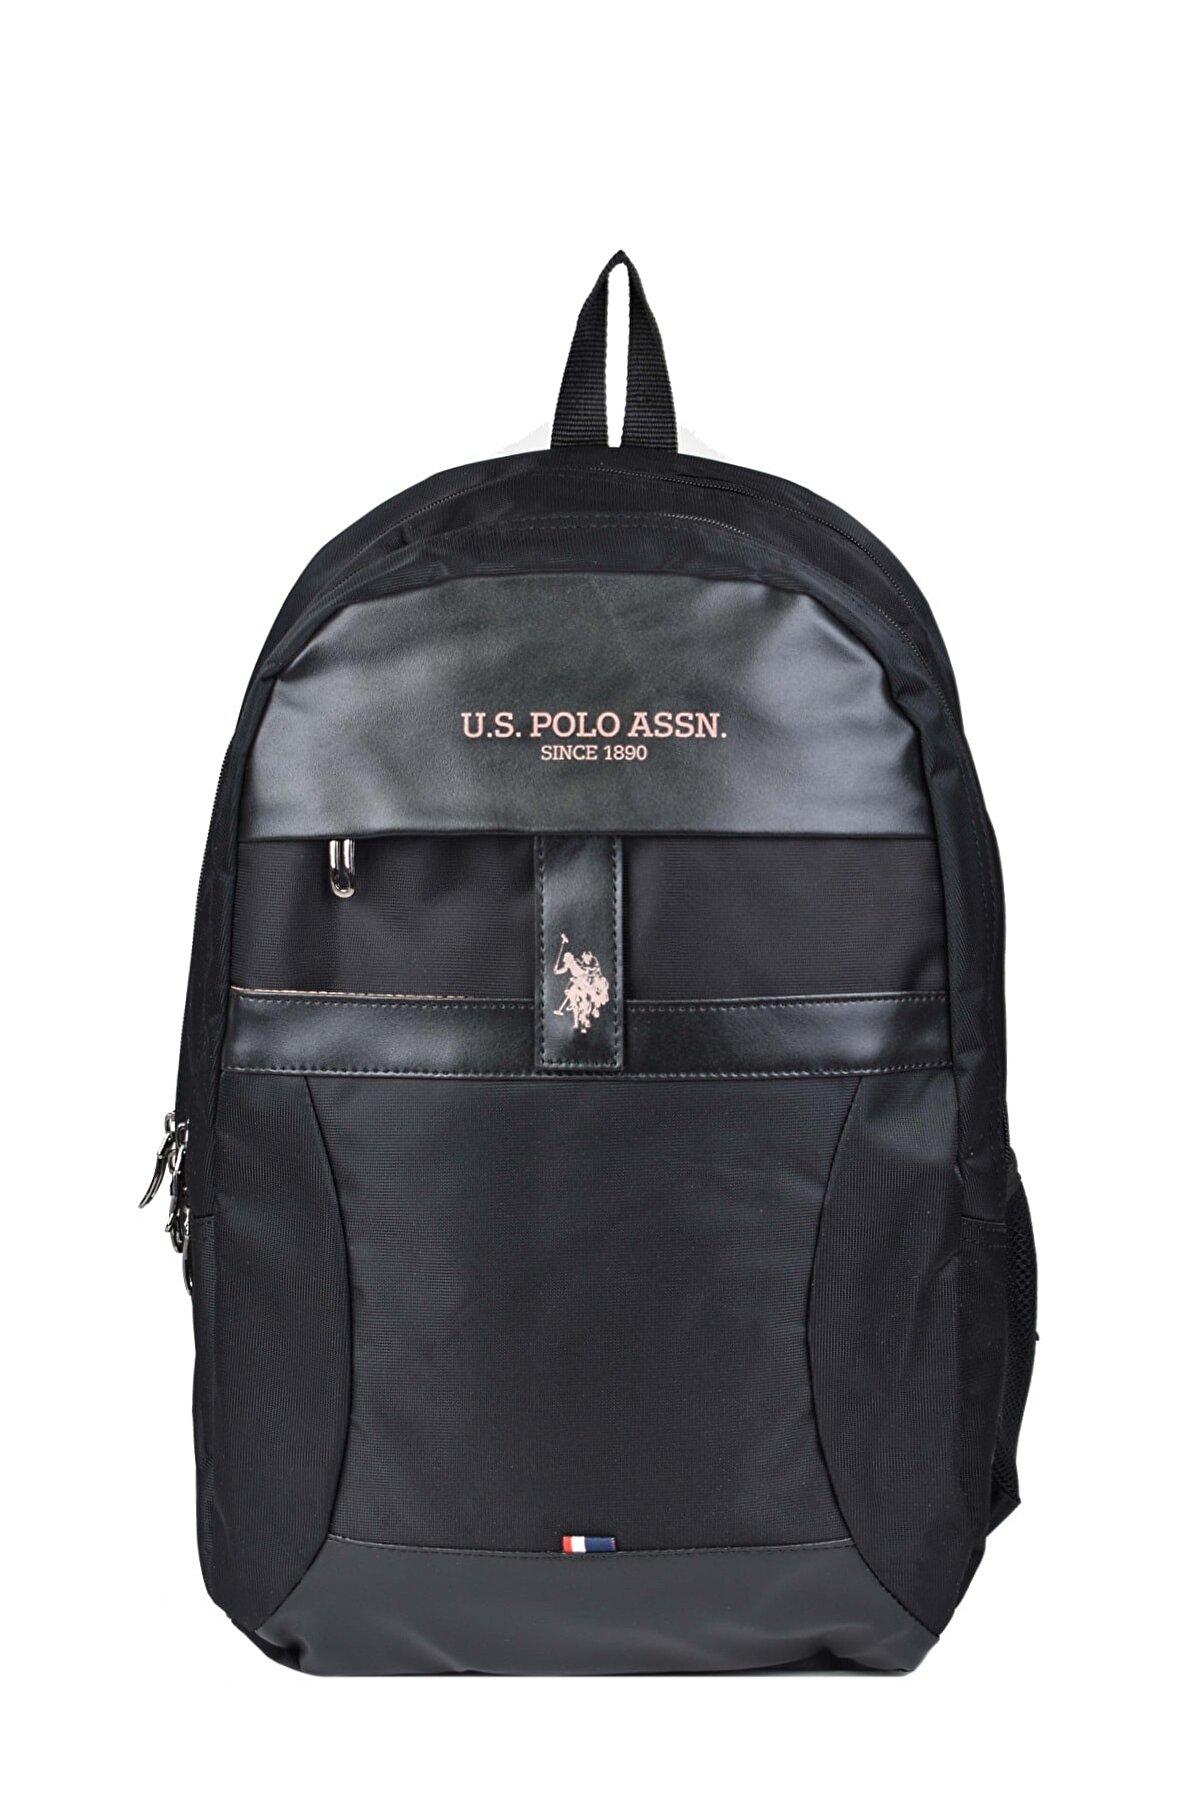 US Polo Assn Sırt Çantası Siyah